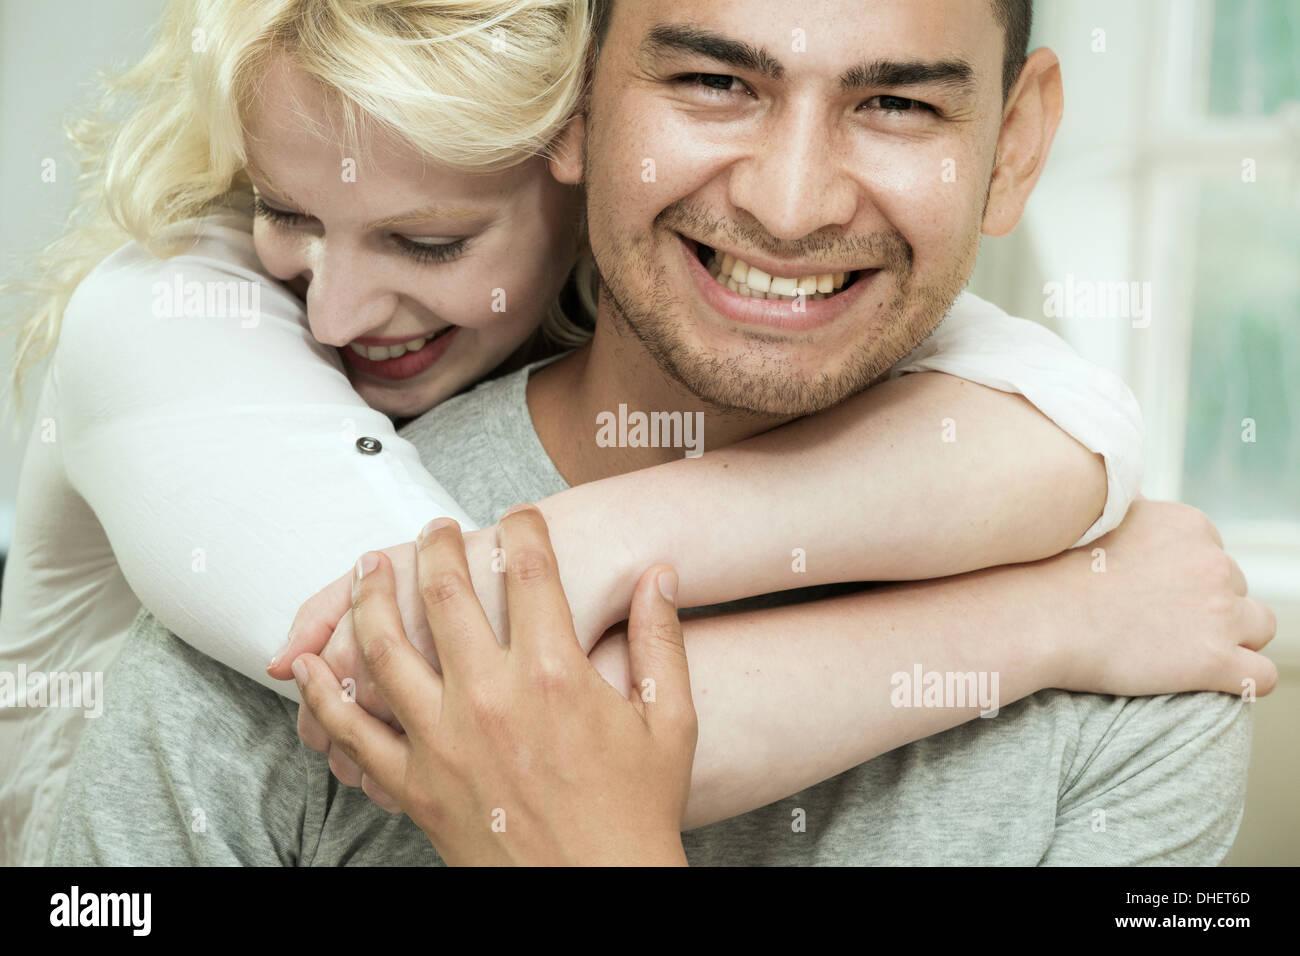 Young woman hugging boyfriend Photo Stock